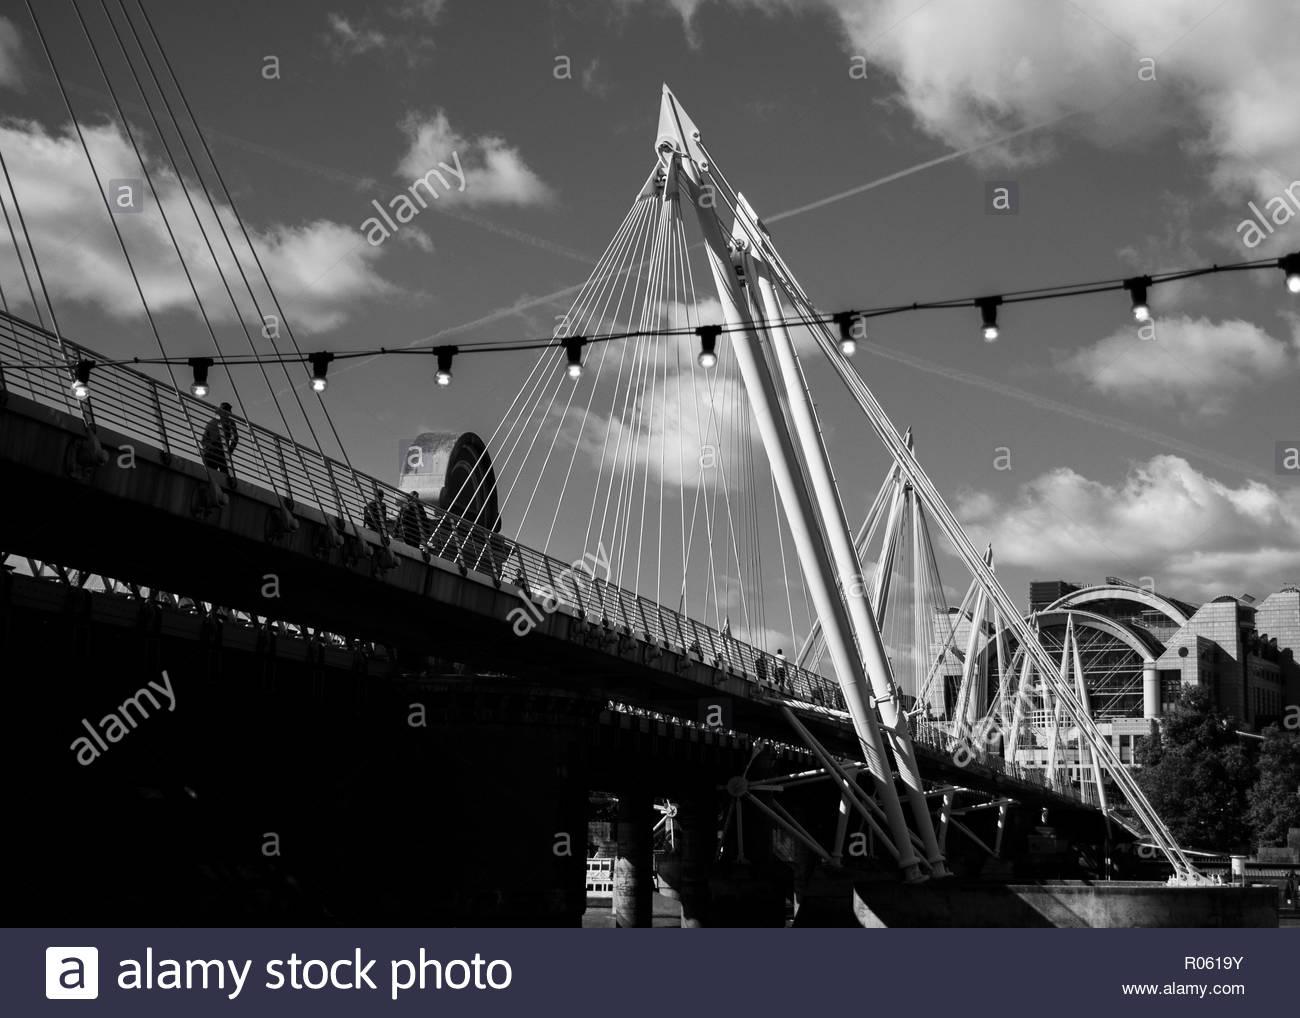 Hungerford Bridge, London - Stock Image